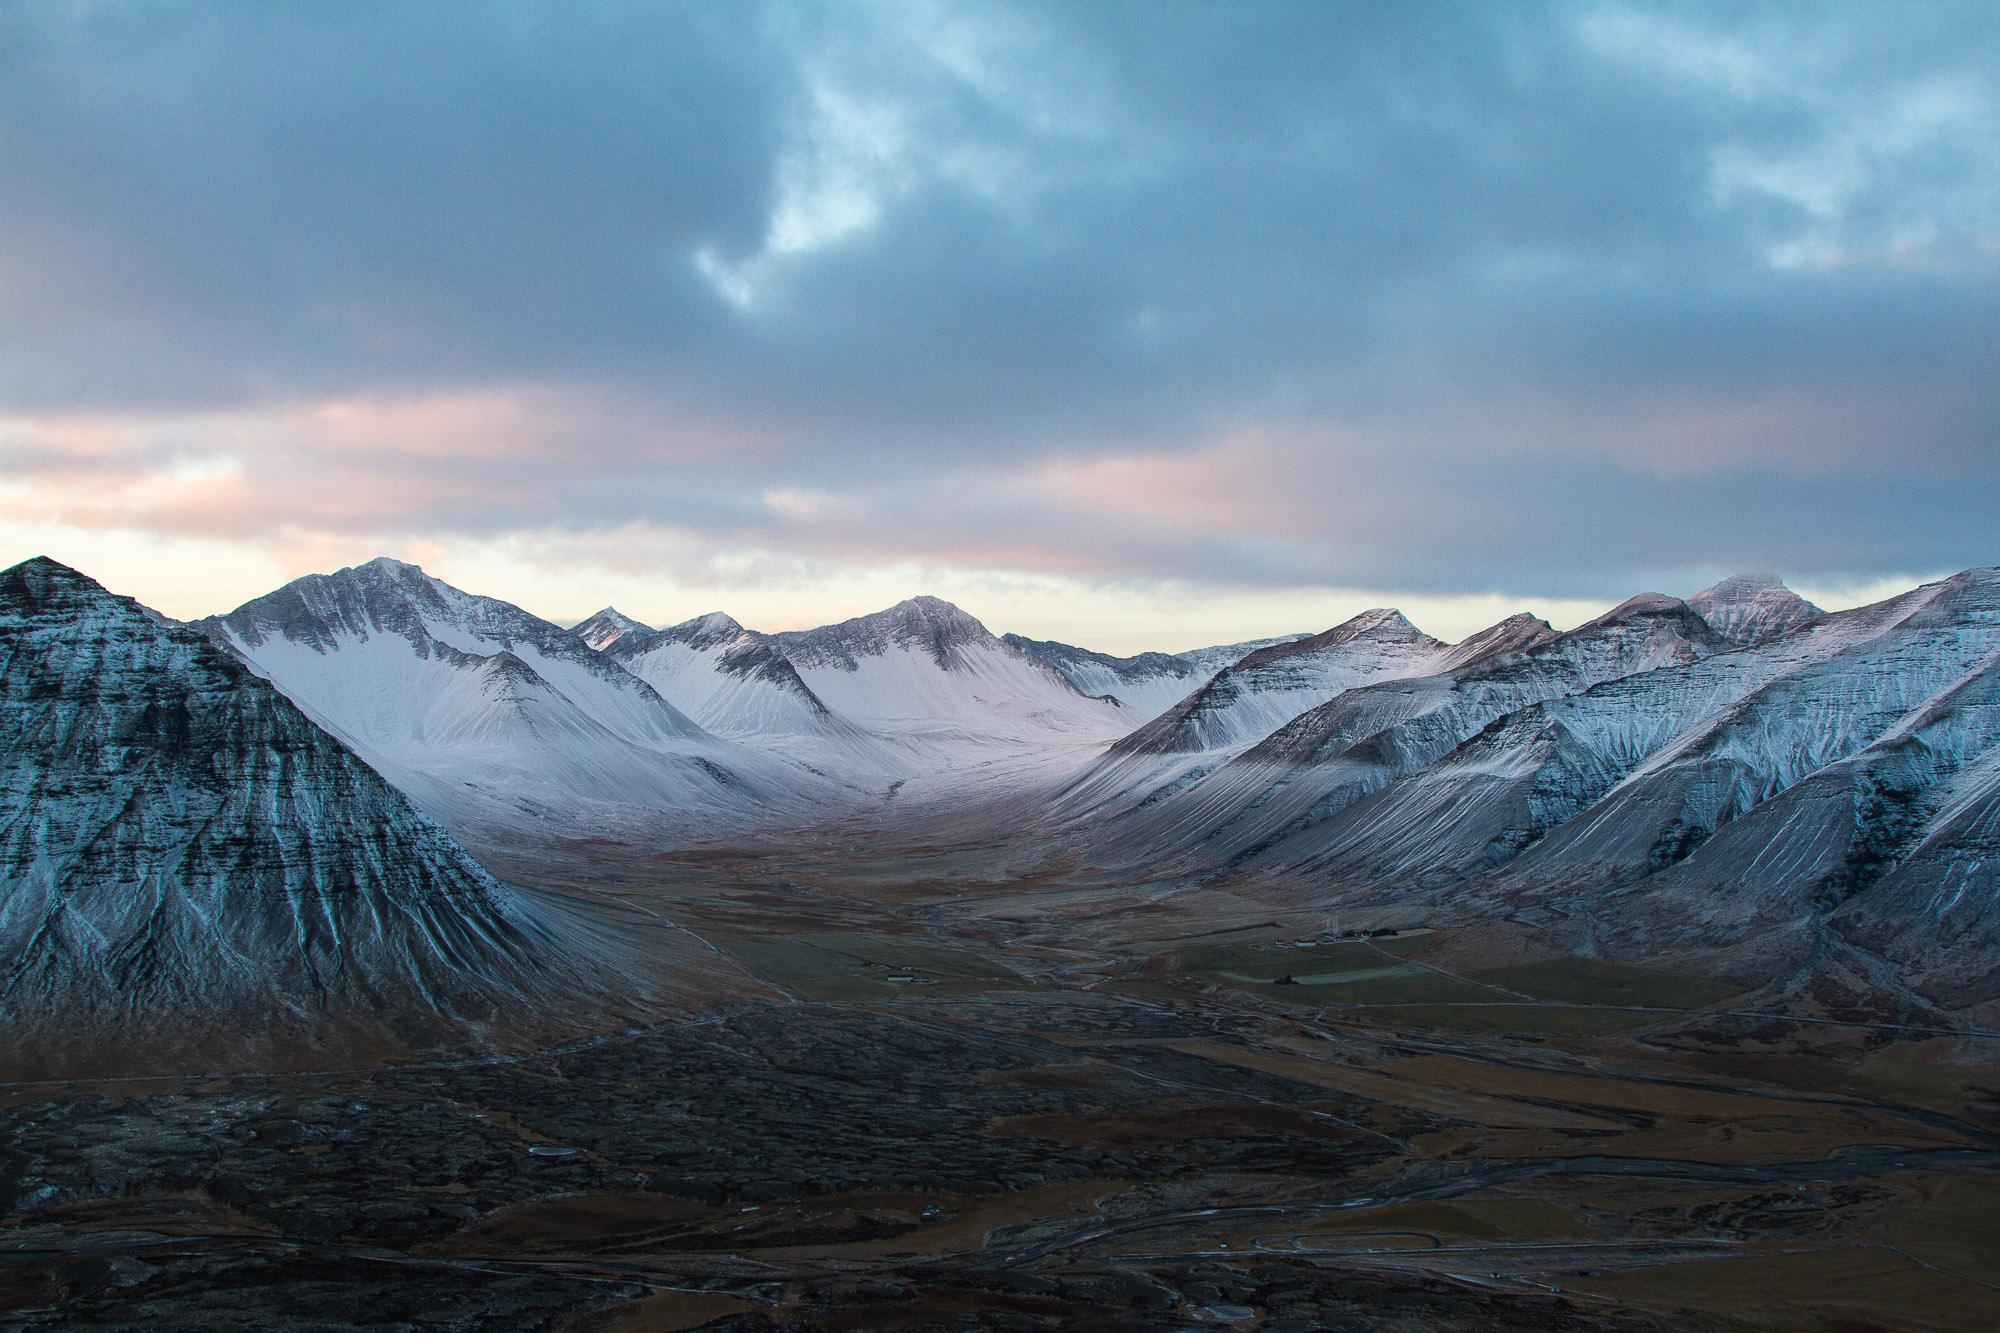 Arctic volcanic landscapes